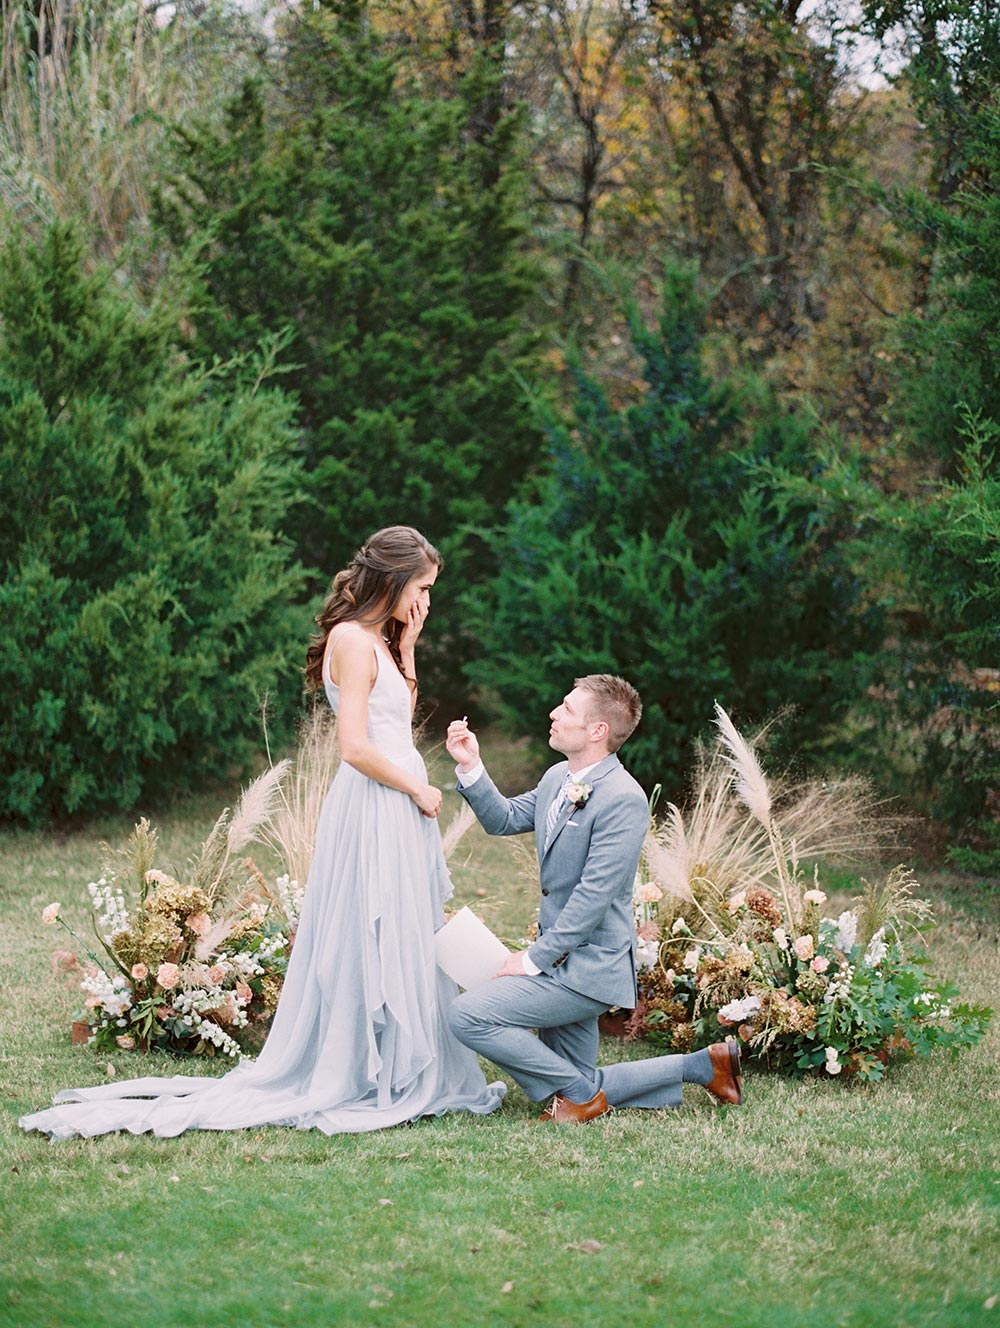 organic ceremony backdrop surprise proposal